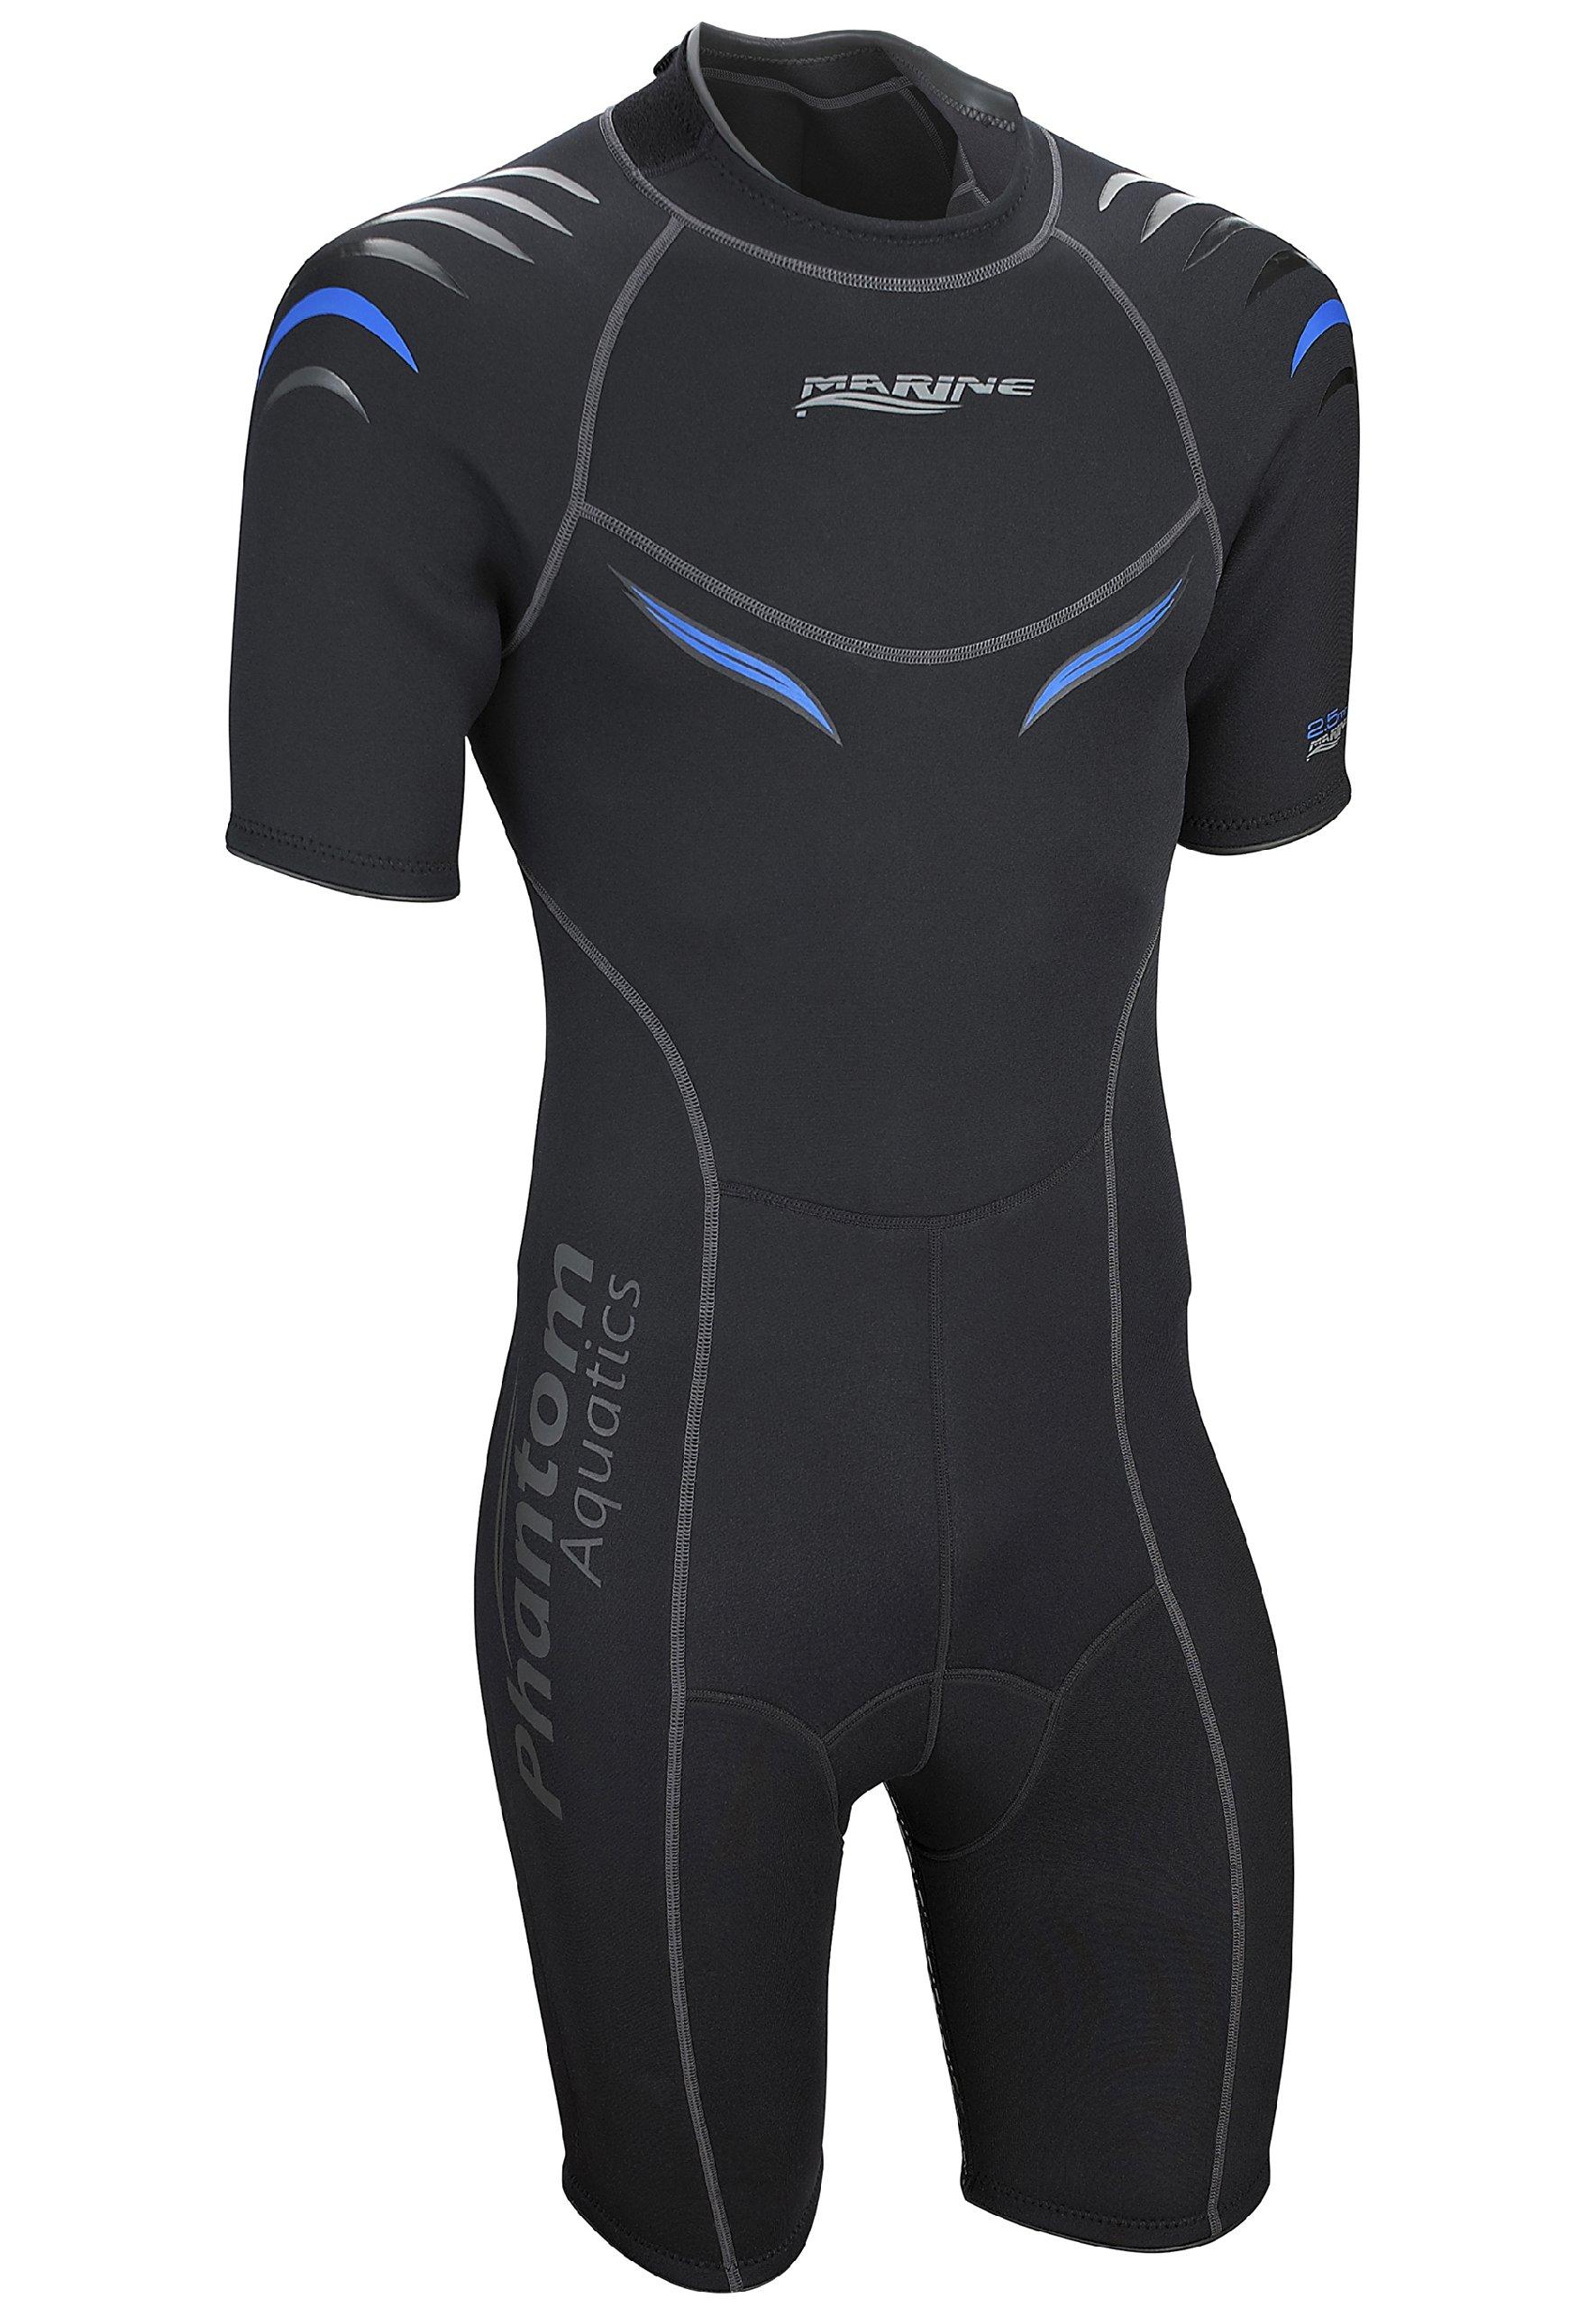 Phantom Aquatics Marine Men's Shorty Wetsuit, Black Blue - Small